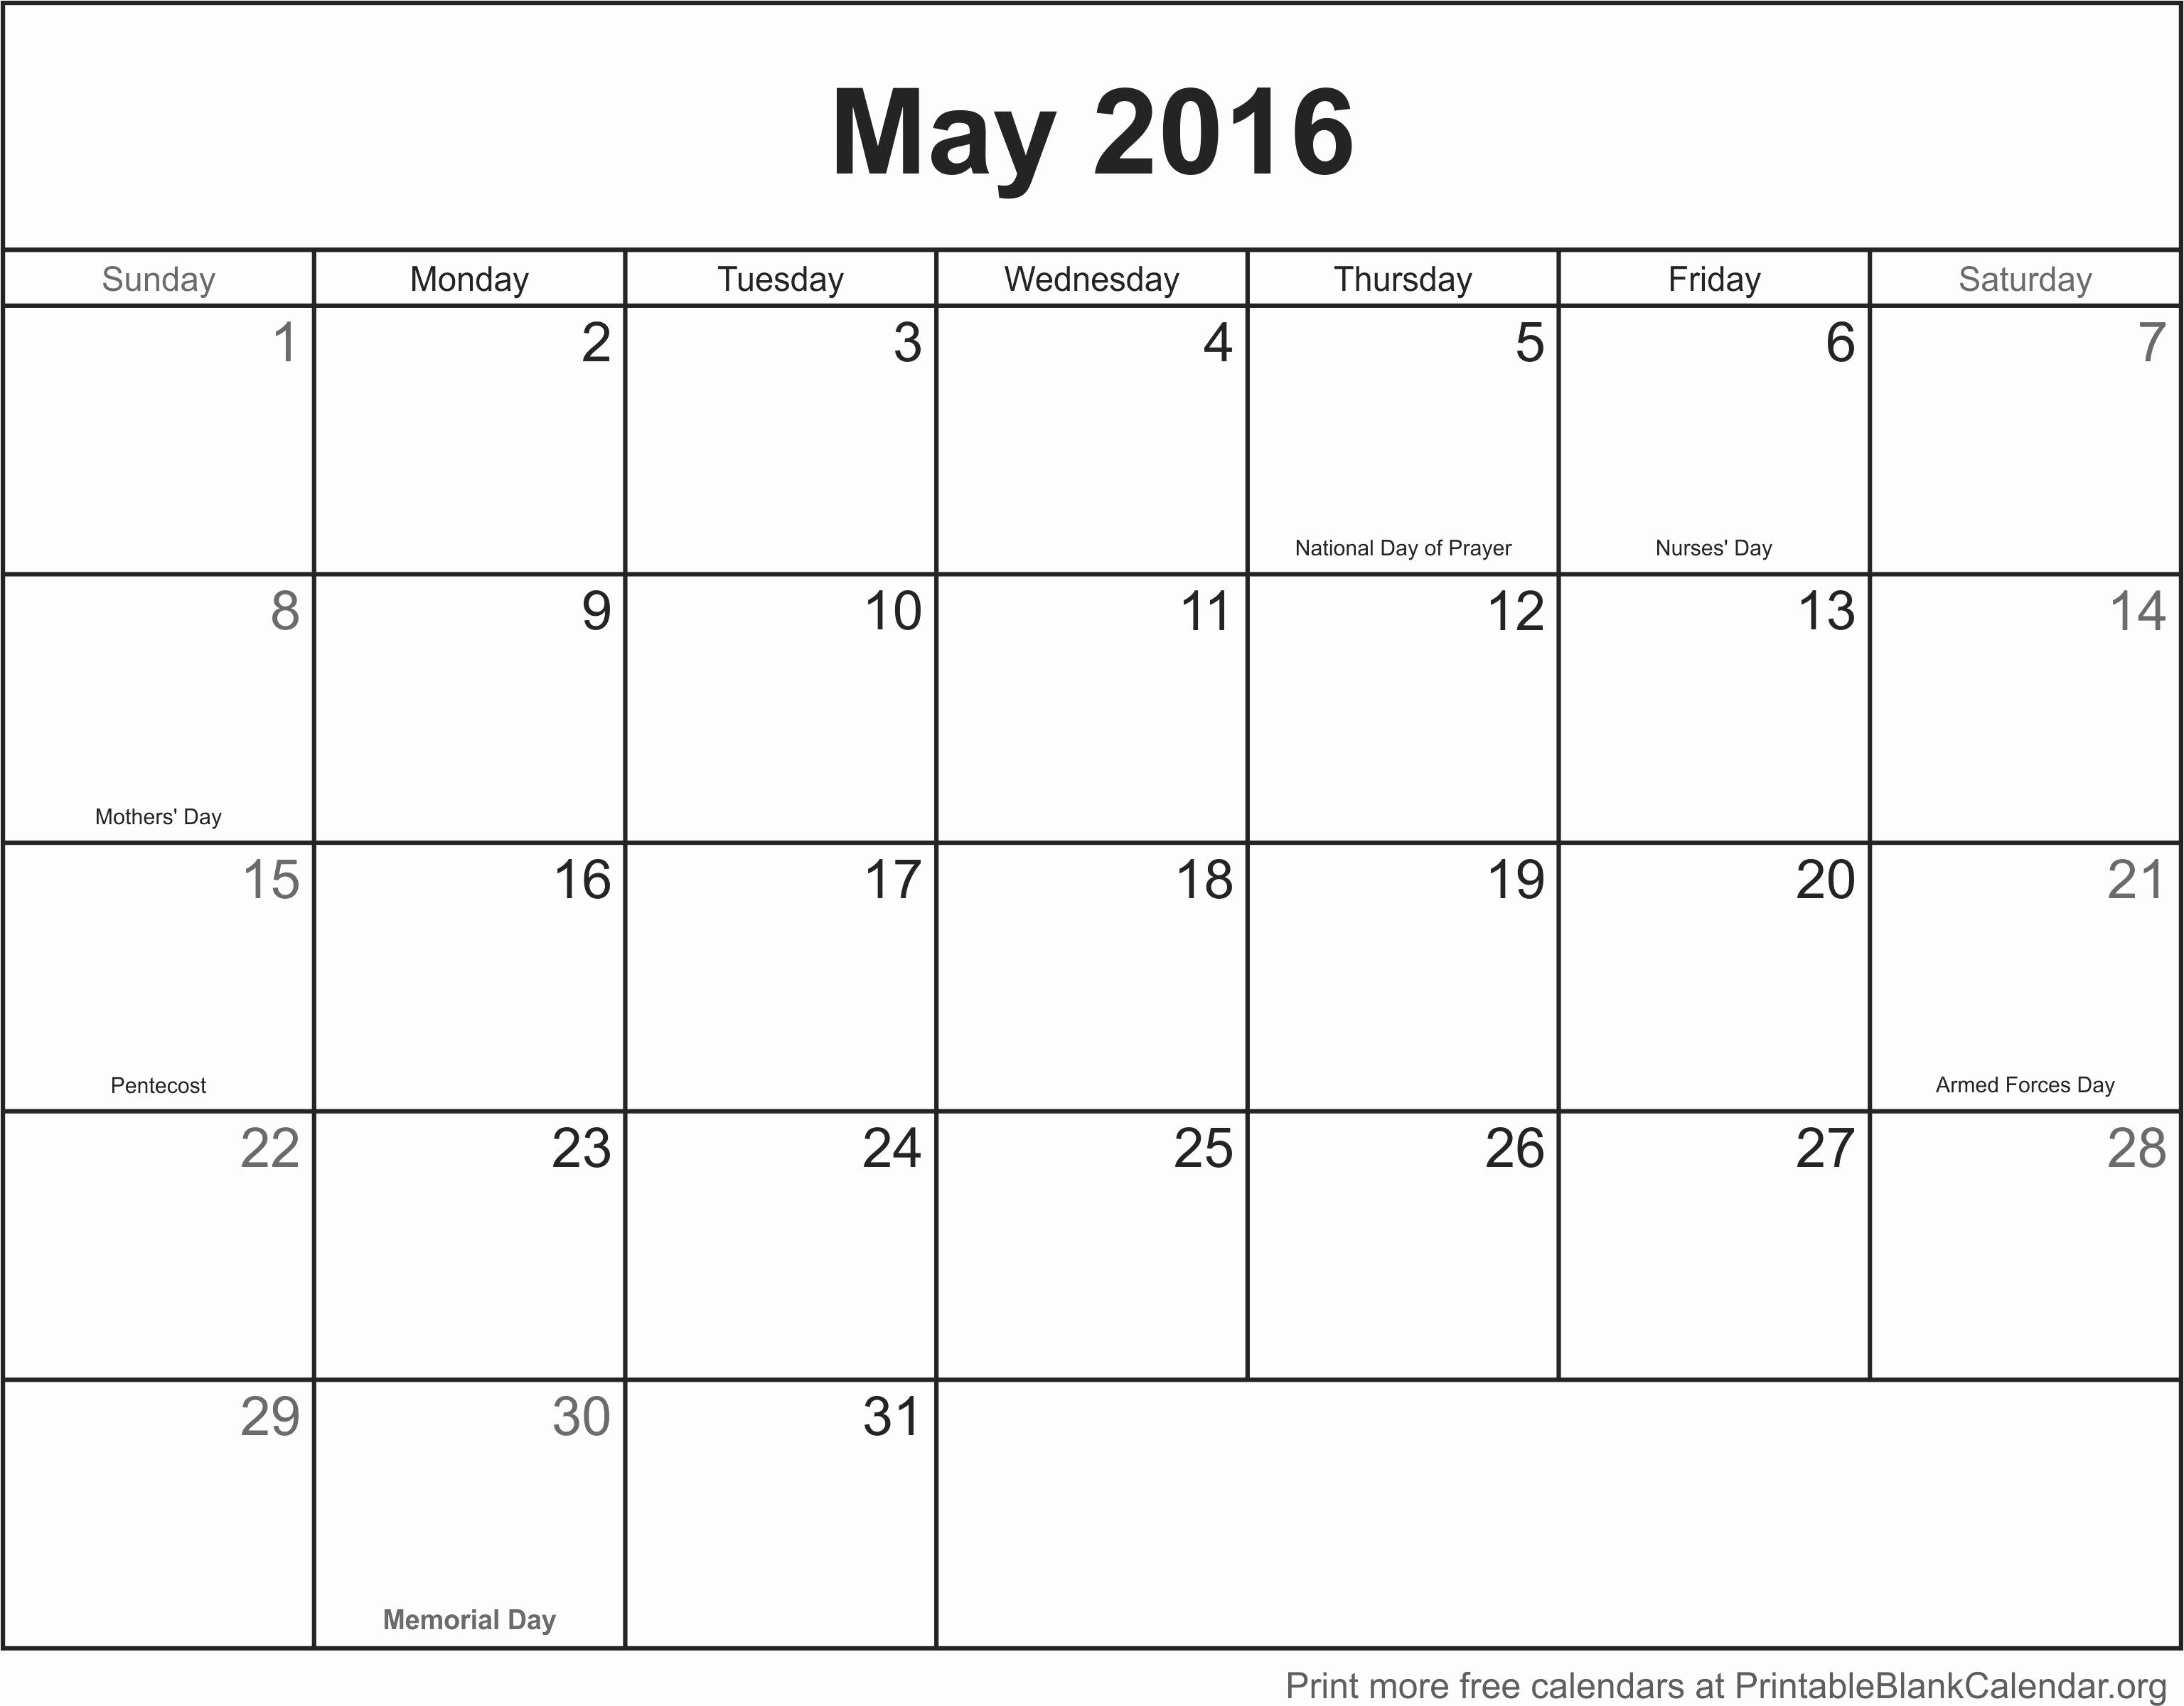 Blank Printable Calendar Or May 2016 Printable Calendar Printable regarding Full Size Blank Printable Calendar